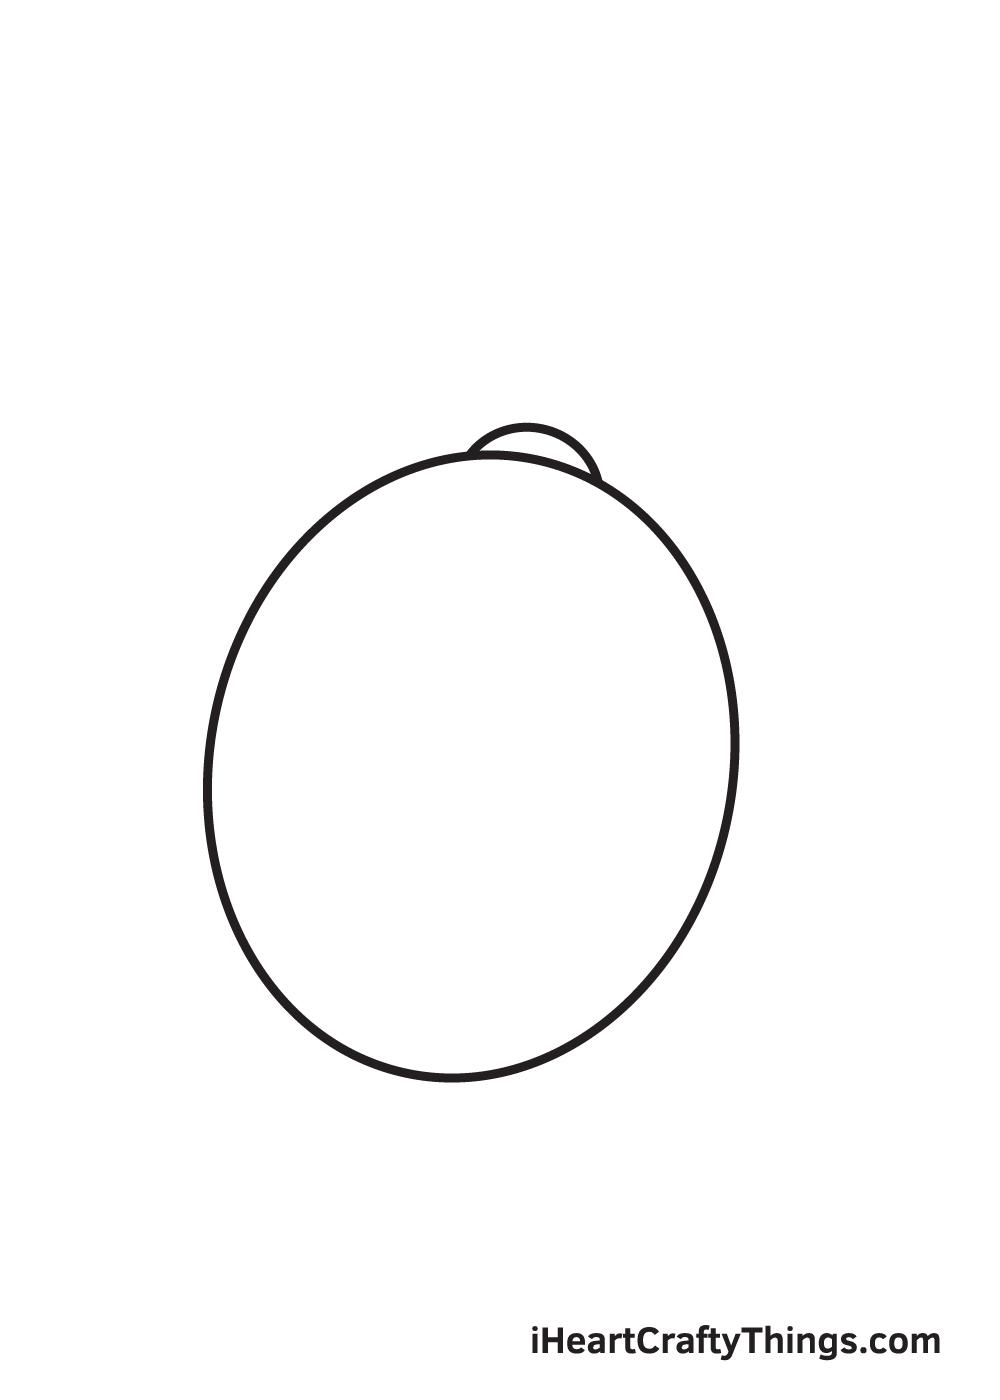 lemon drawing step 2